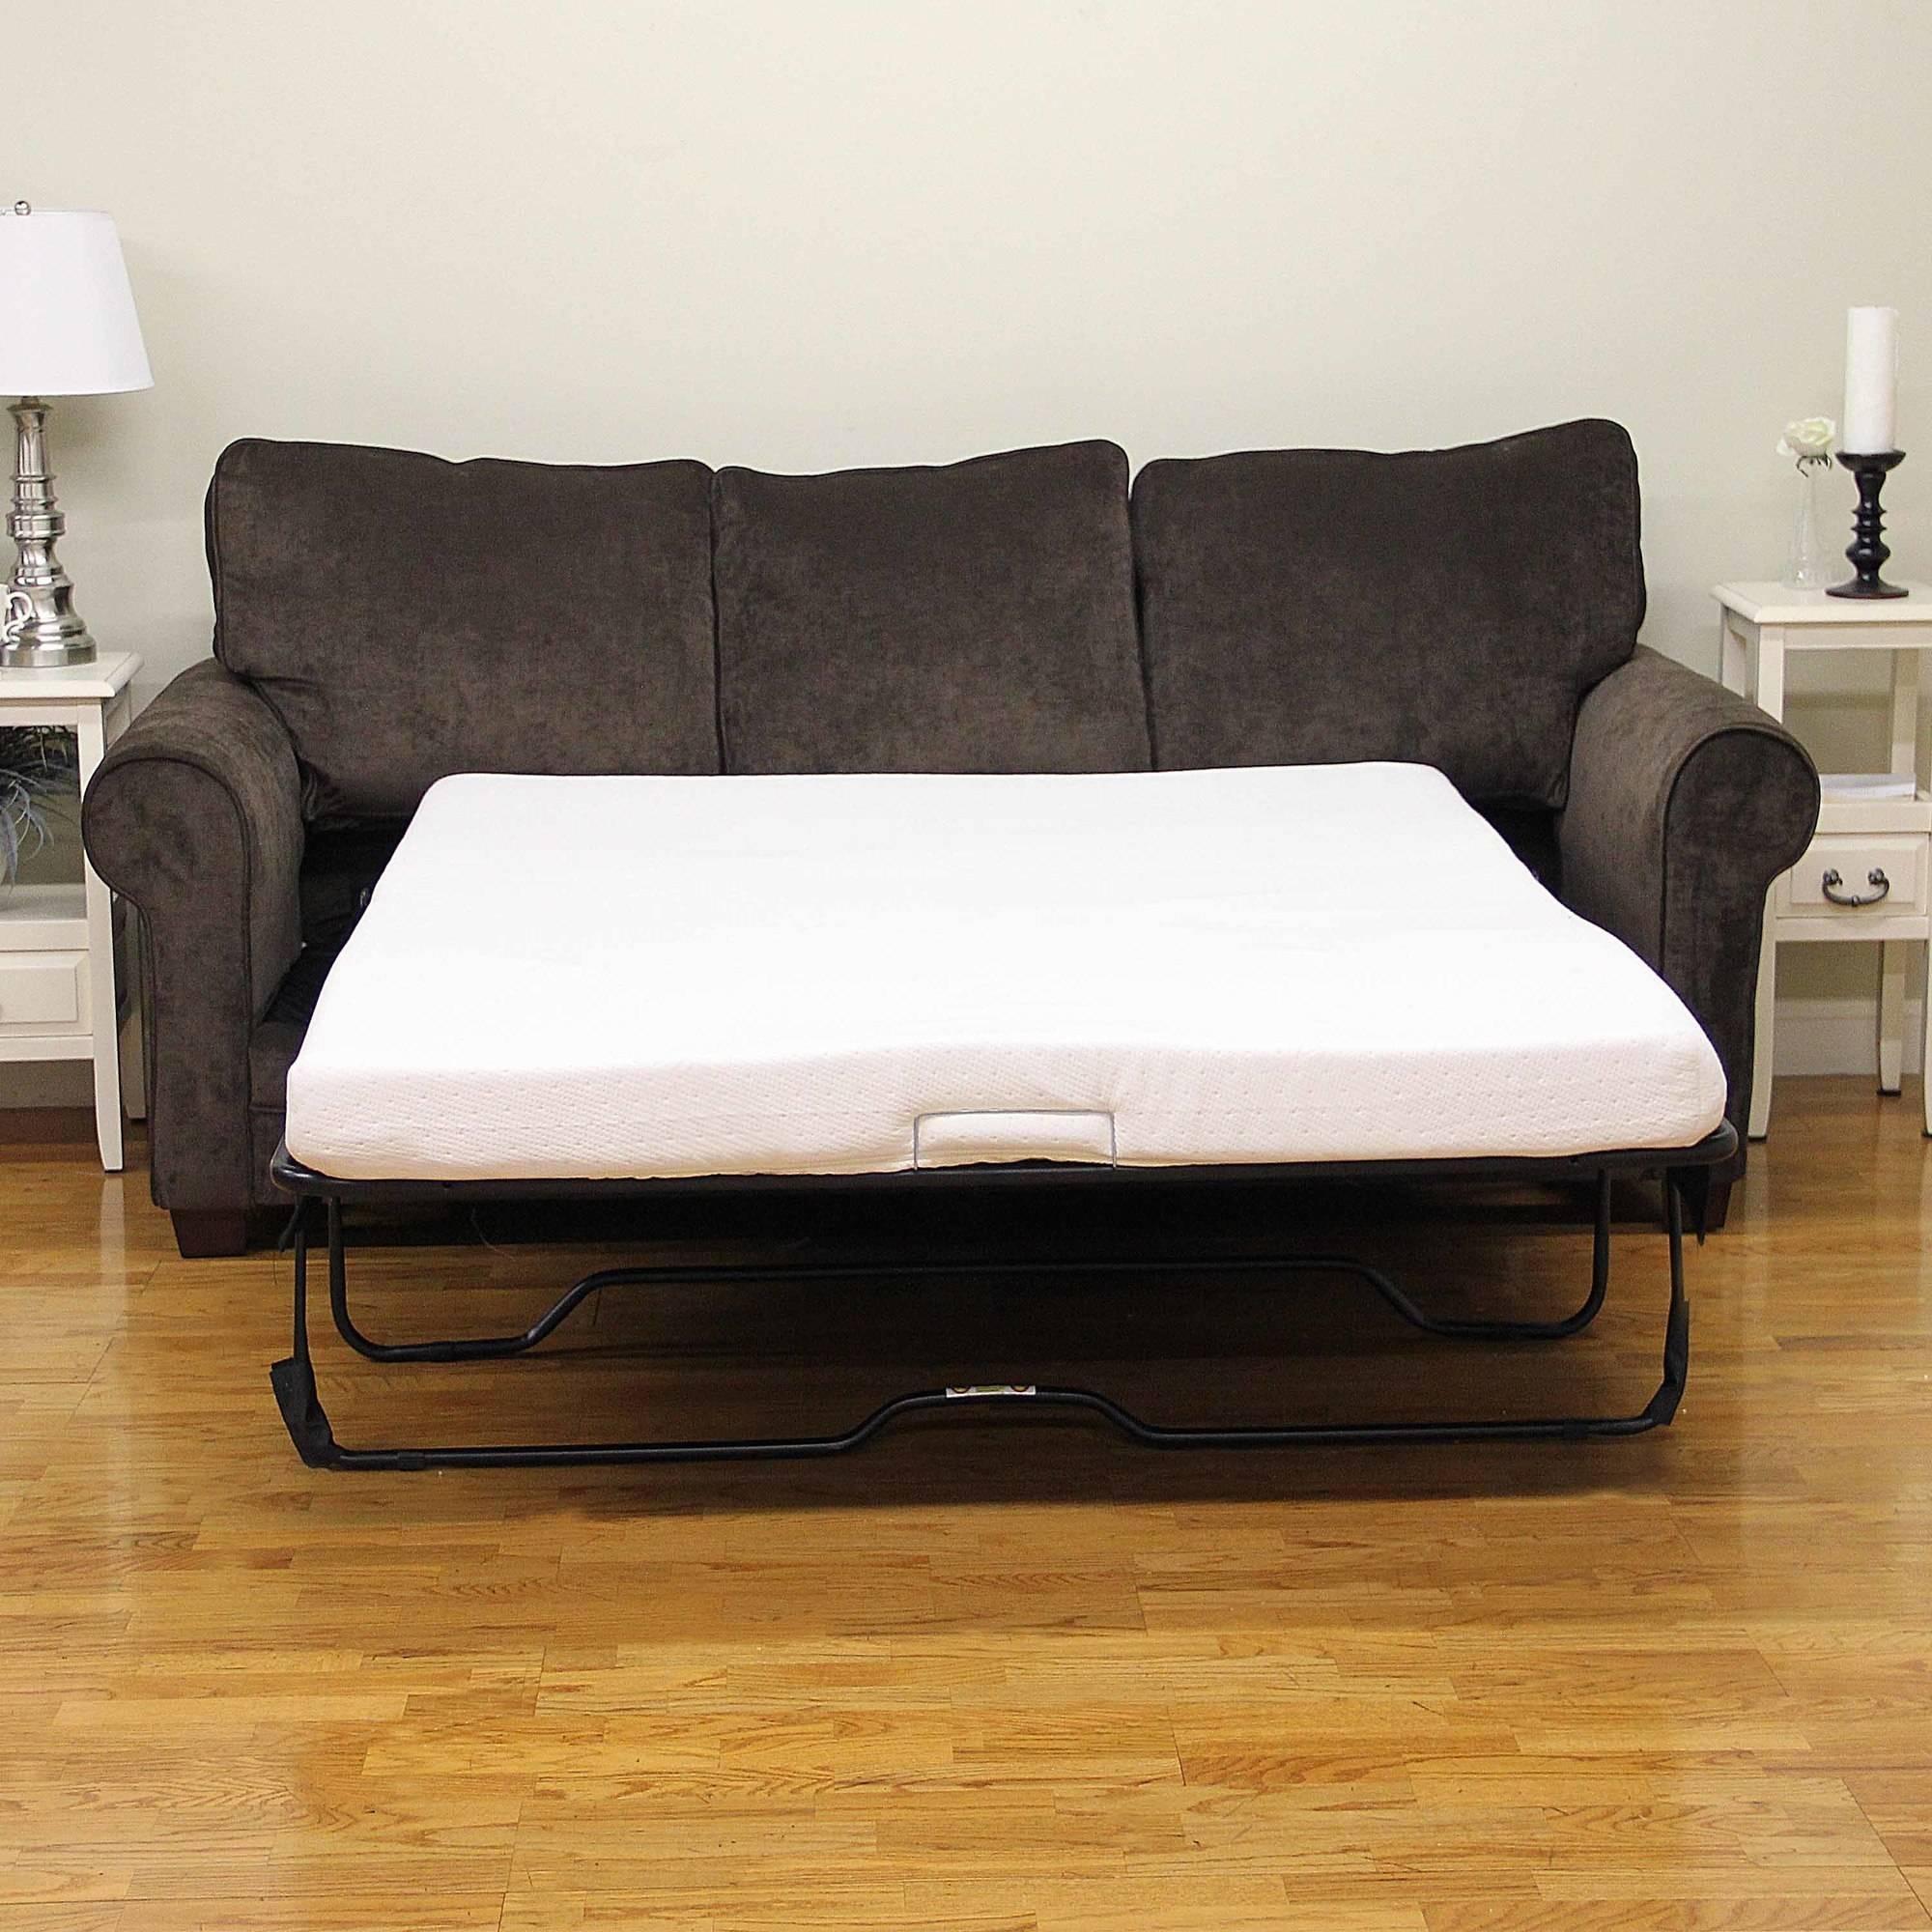 Modern Sleep Memory Foam  (Image 11 of 20)